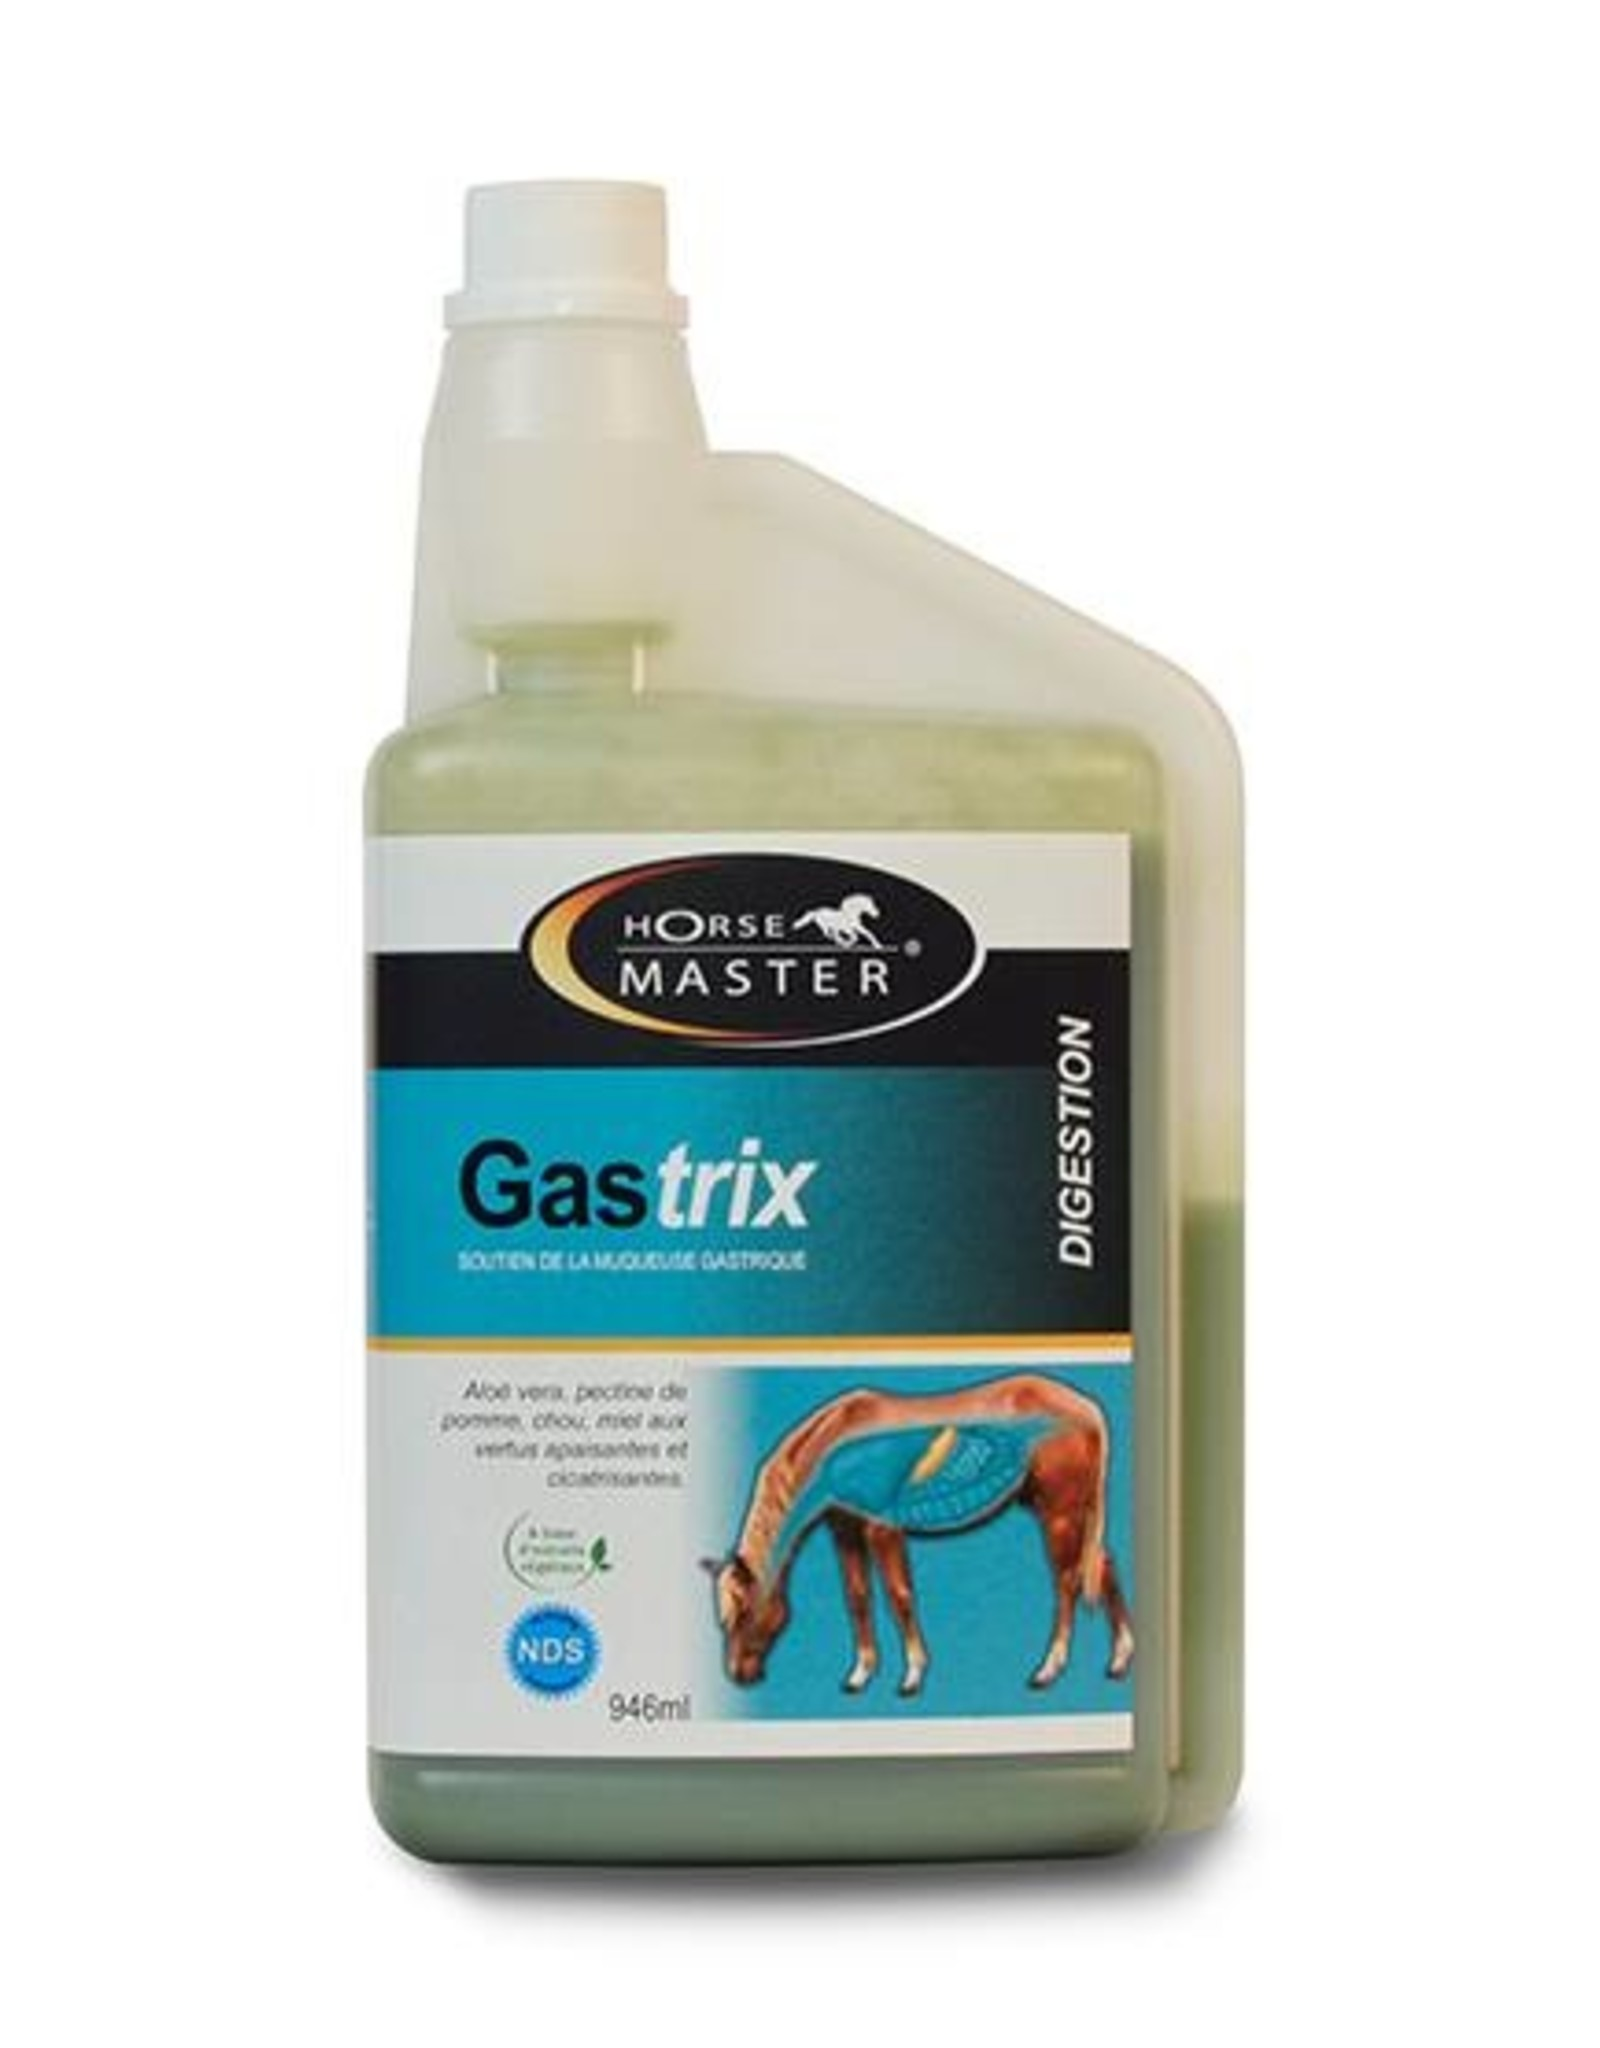 Horse Master Gastrix